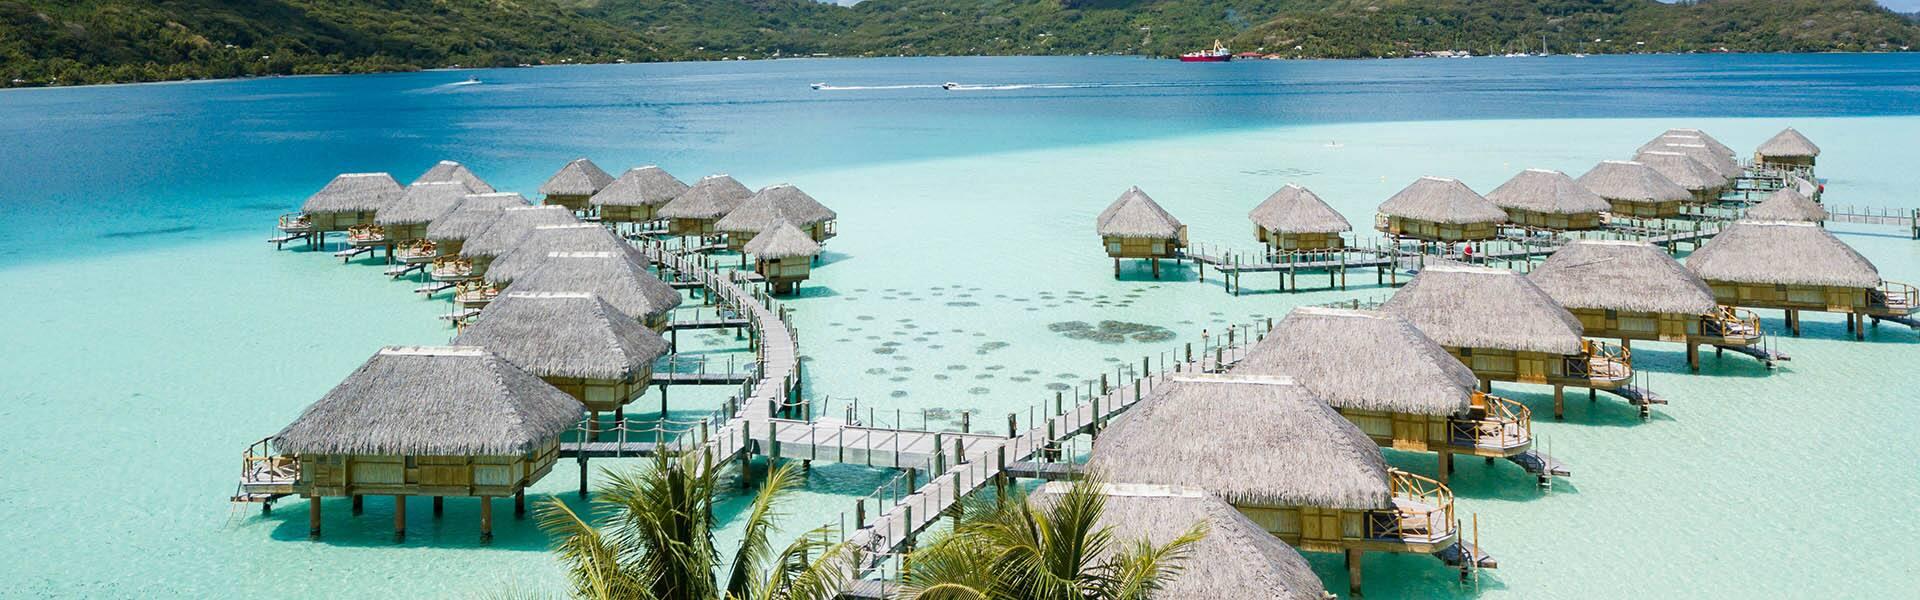 Südpazifik: Bora Bora, Kauaiund Maui nach Papeete